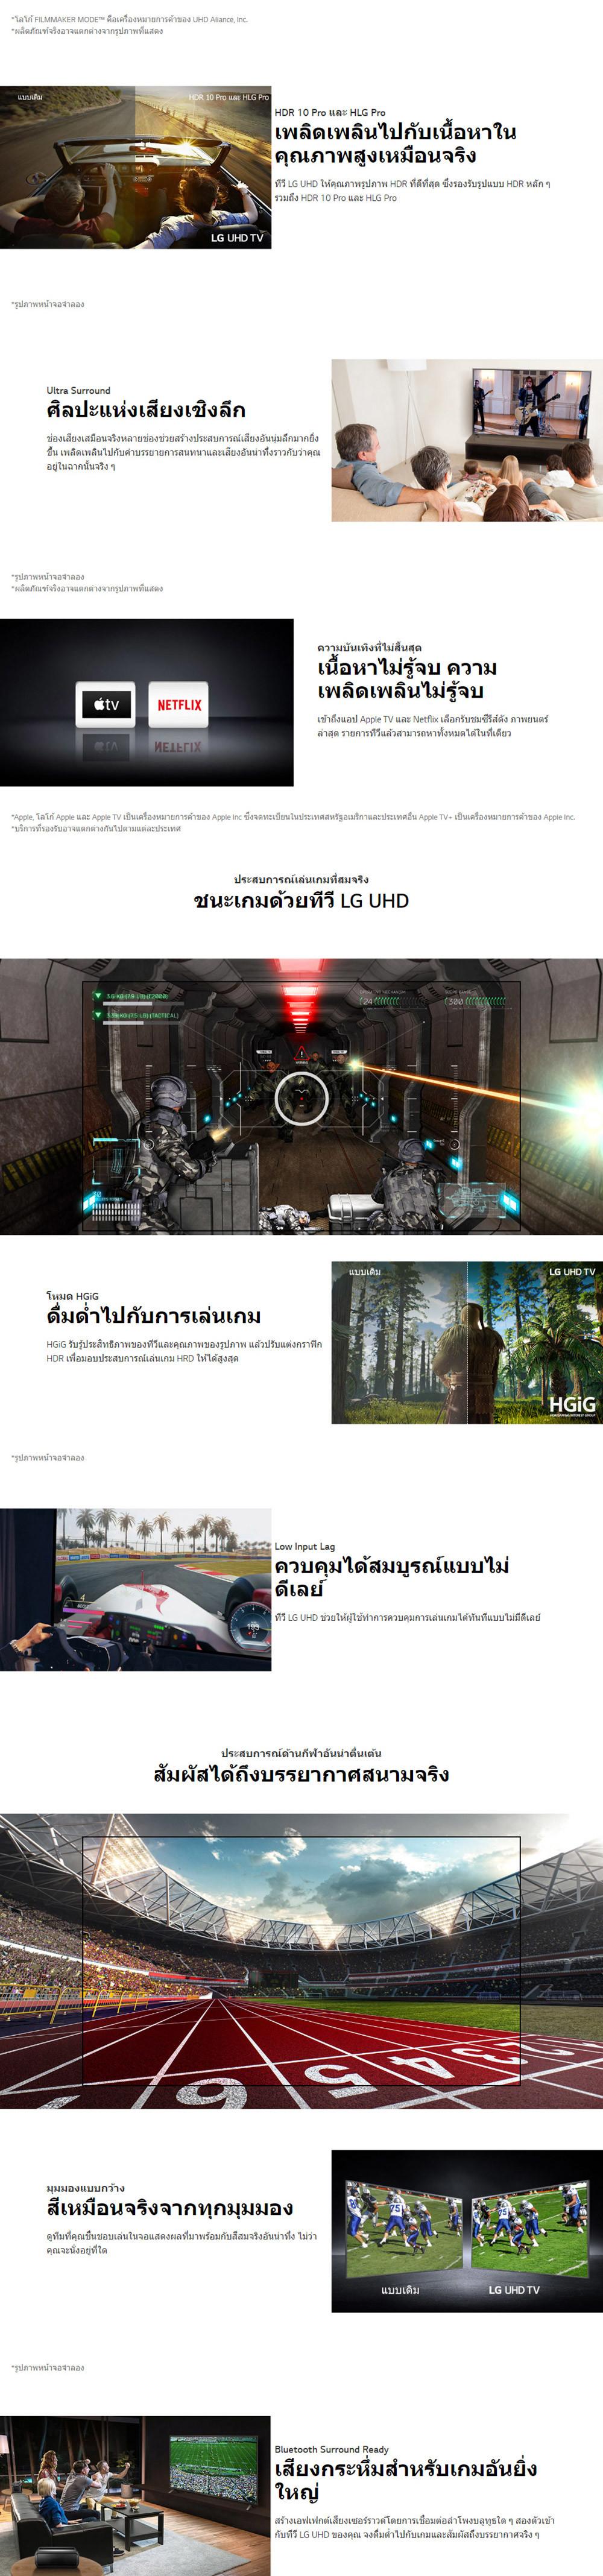 content-image-1_2.jpg